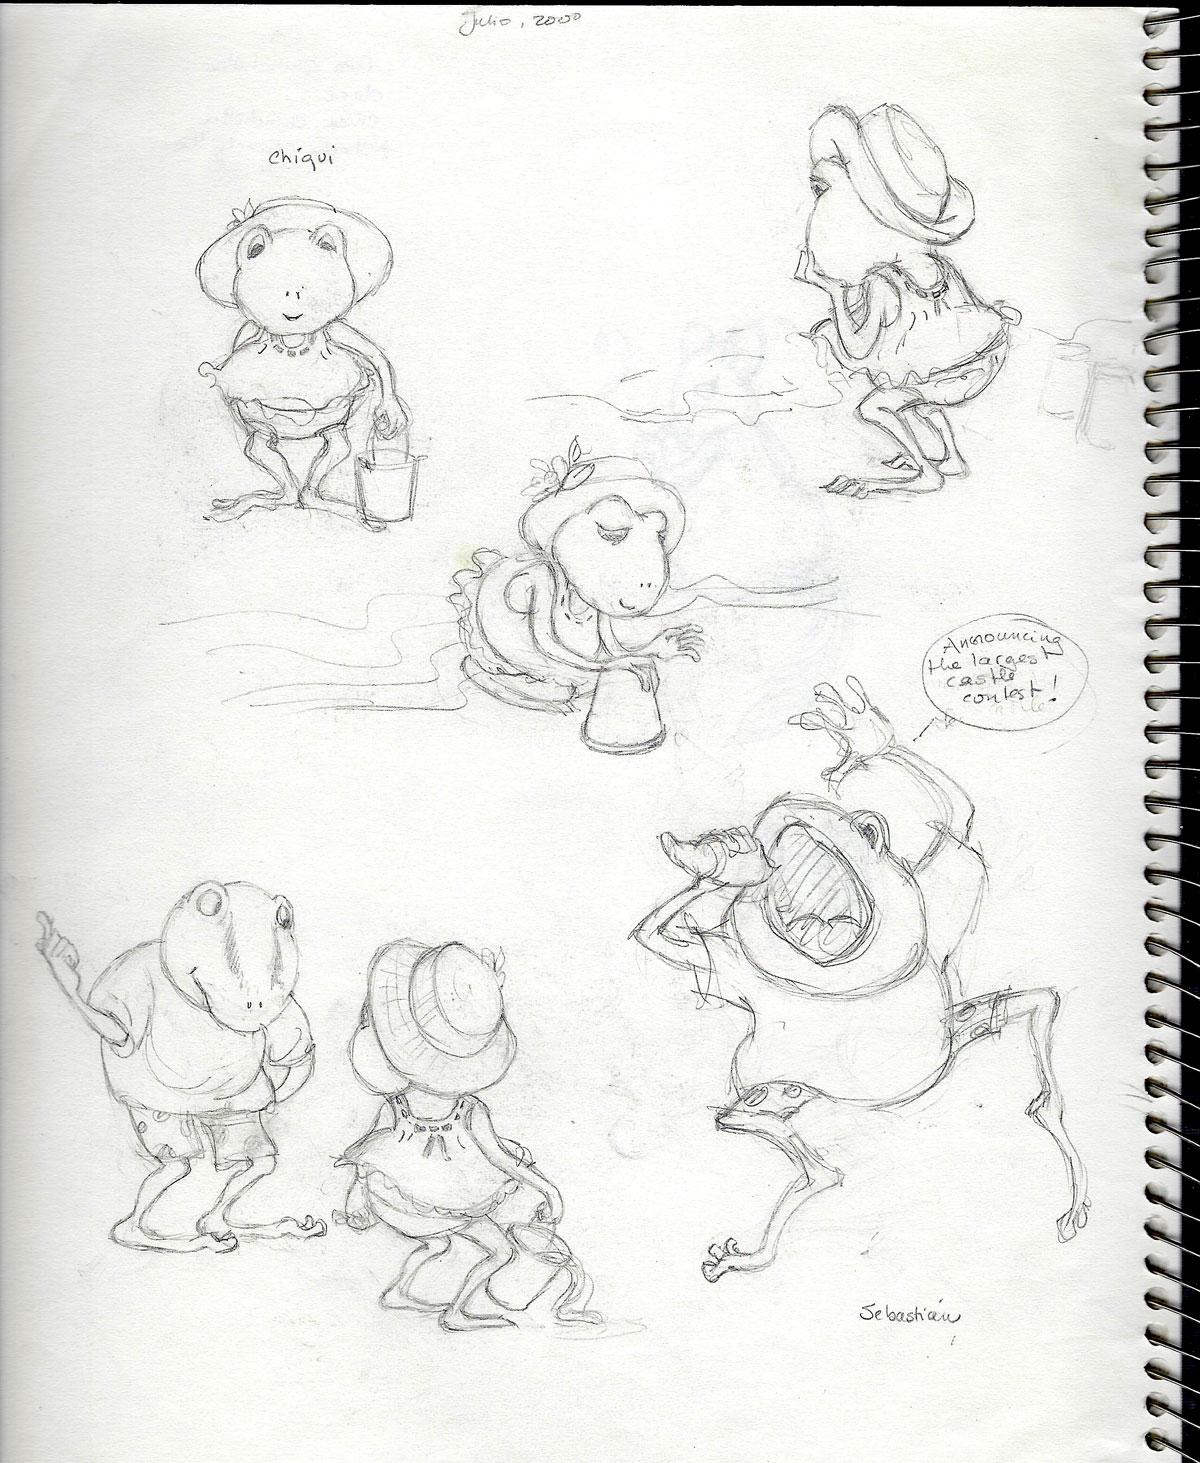 Sketchbook-Rafi-and-Rosi-1.jpg